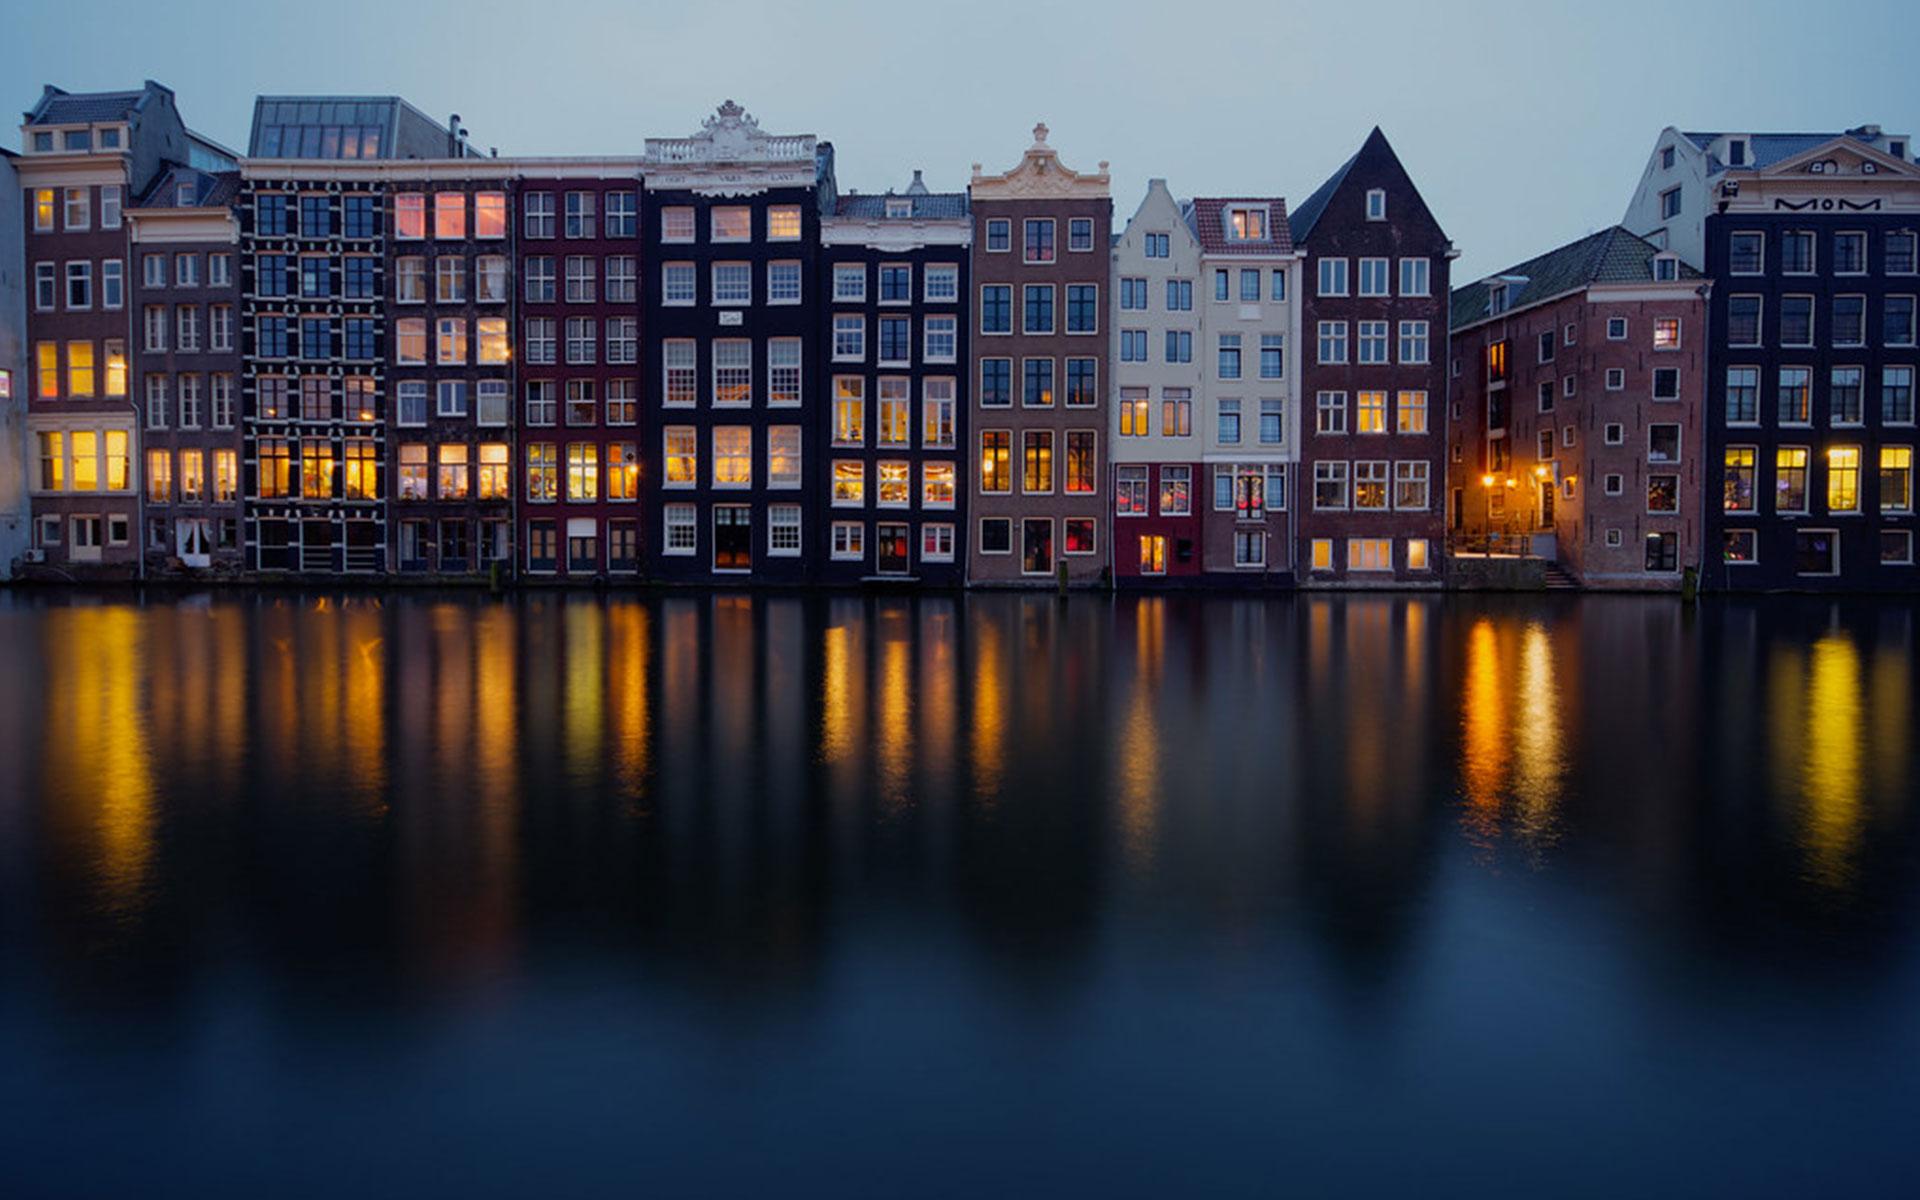 Dutch Brainwash-7 December